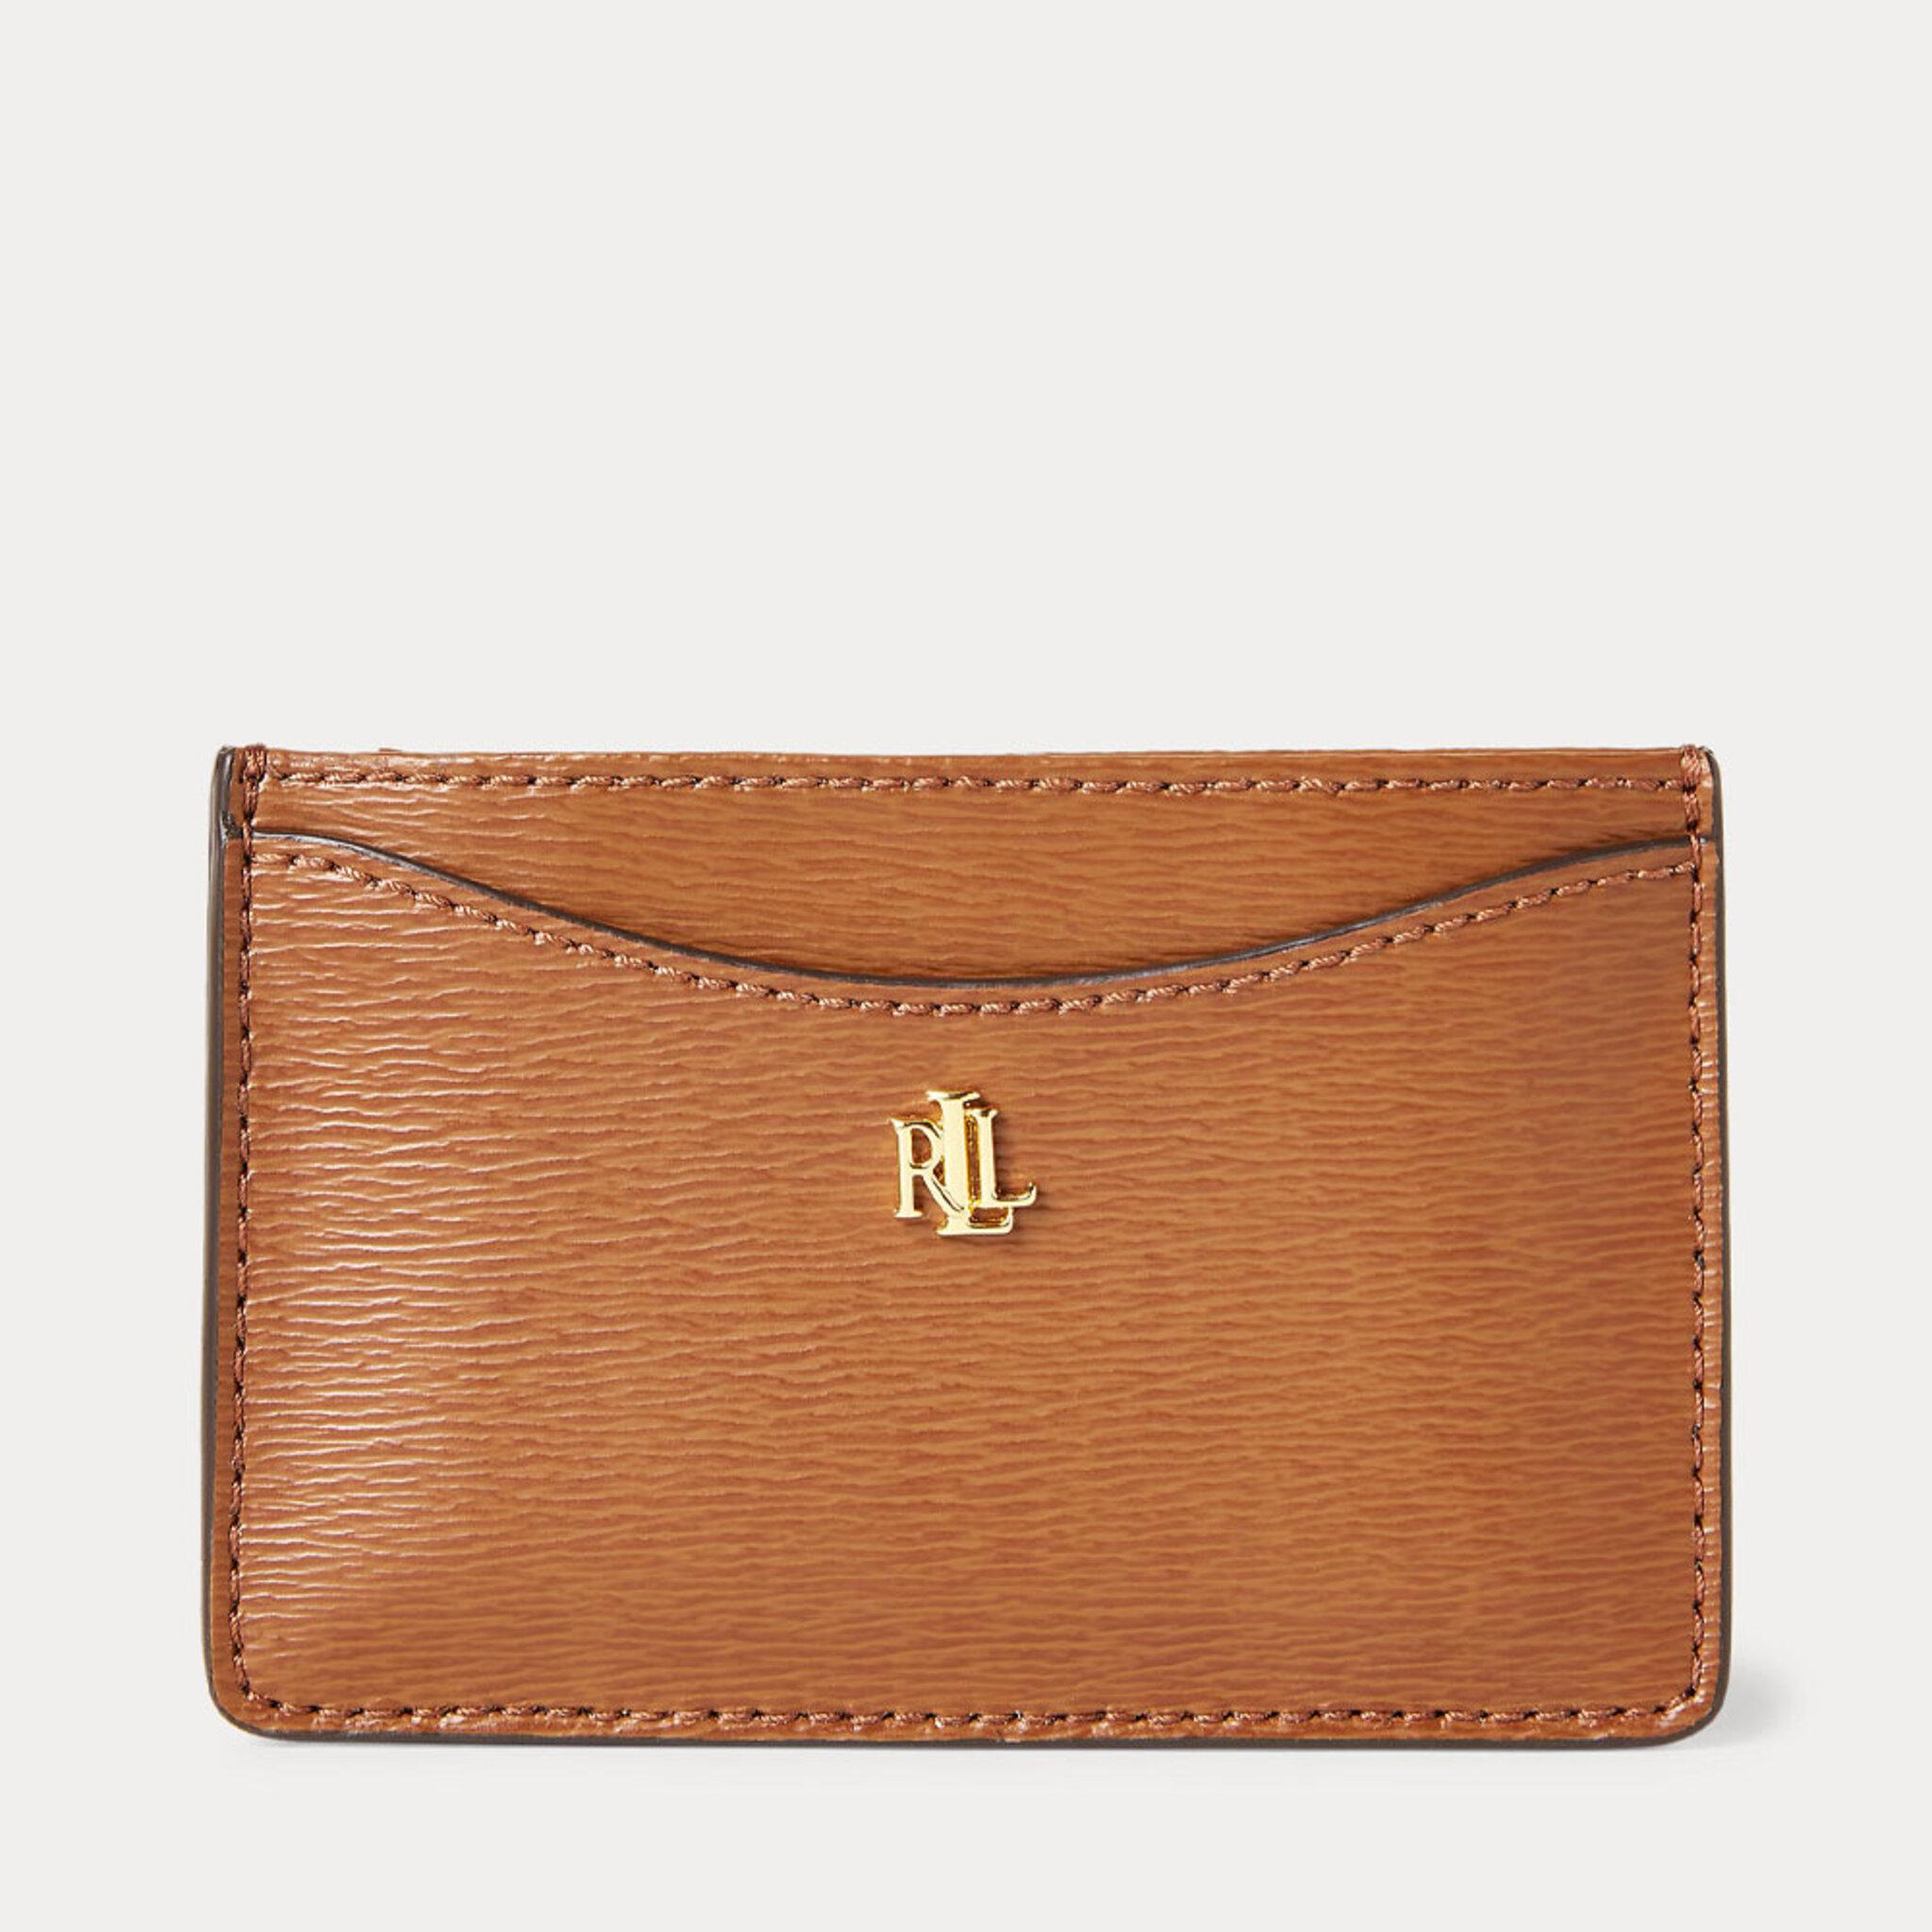 Saffiano Leather Card Case, OS